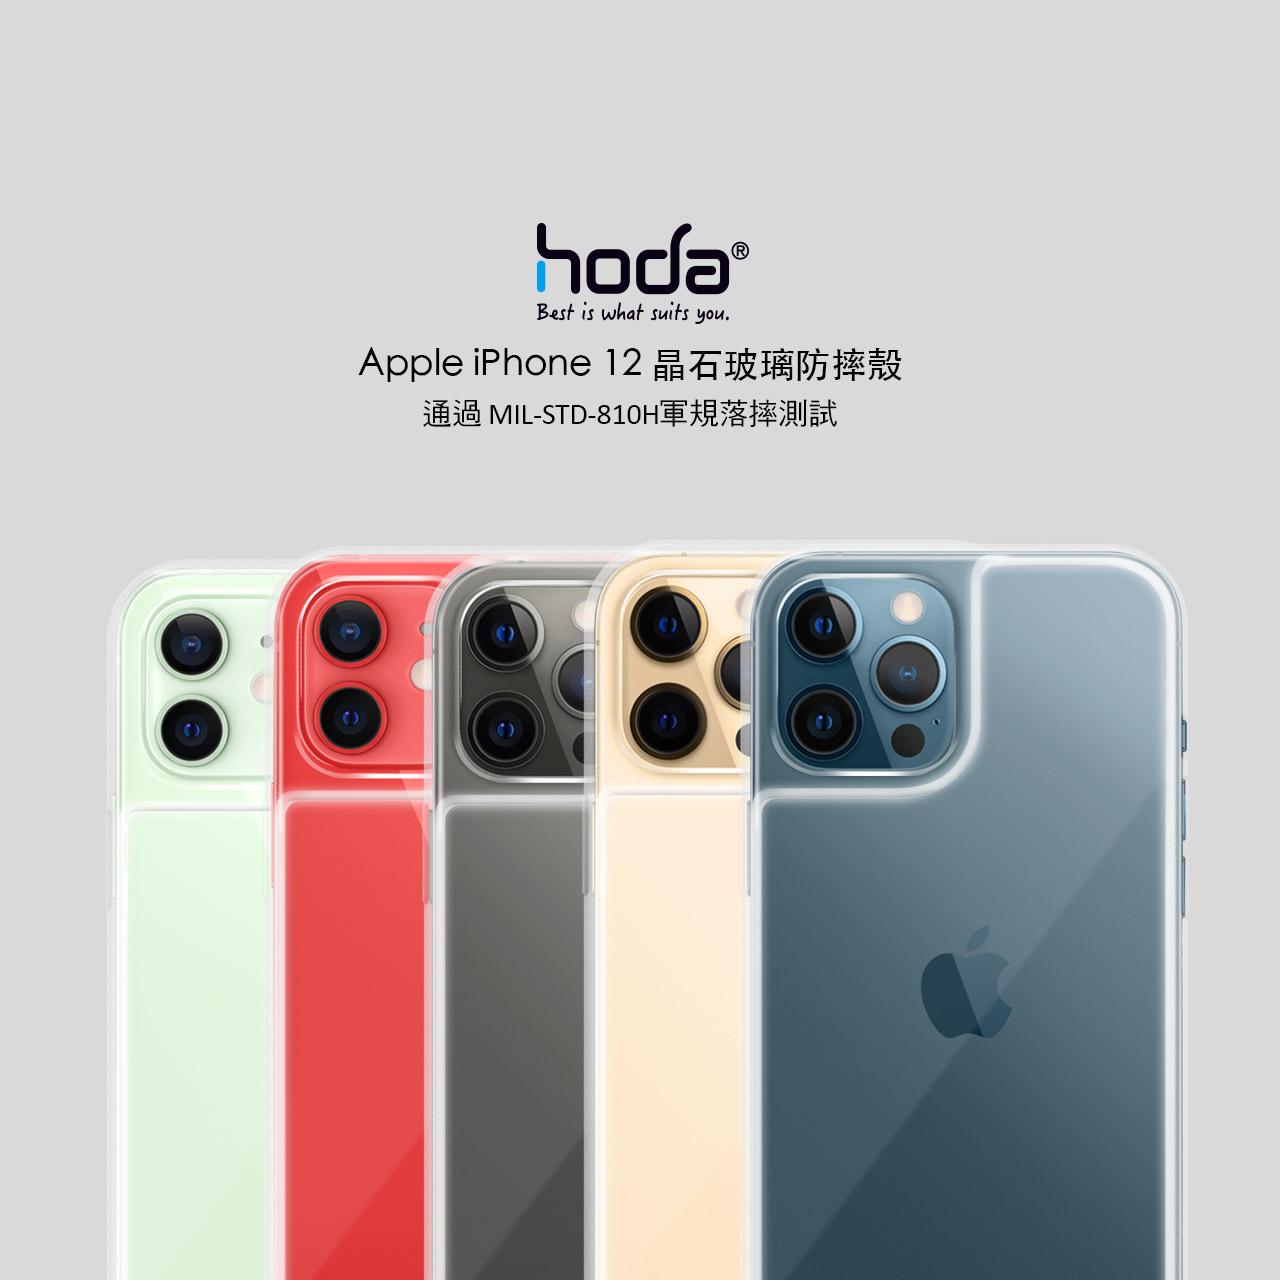 hoda 晶石鋼化玻璃軍規防摔保護殼